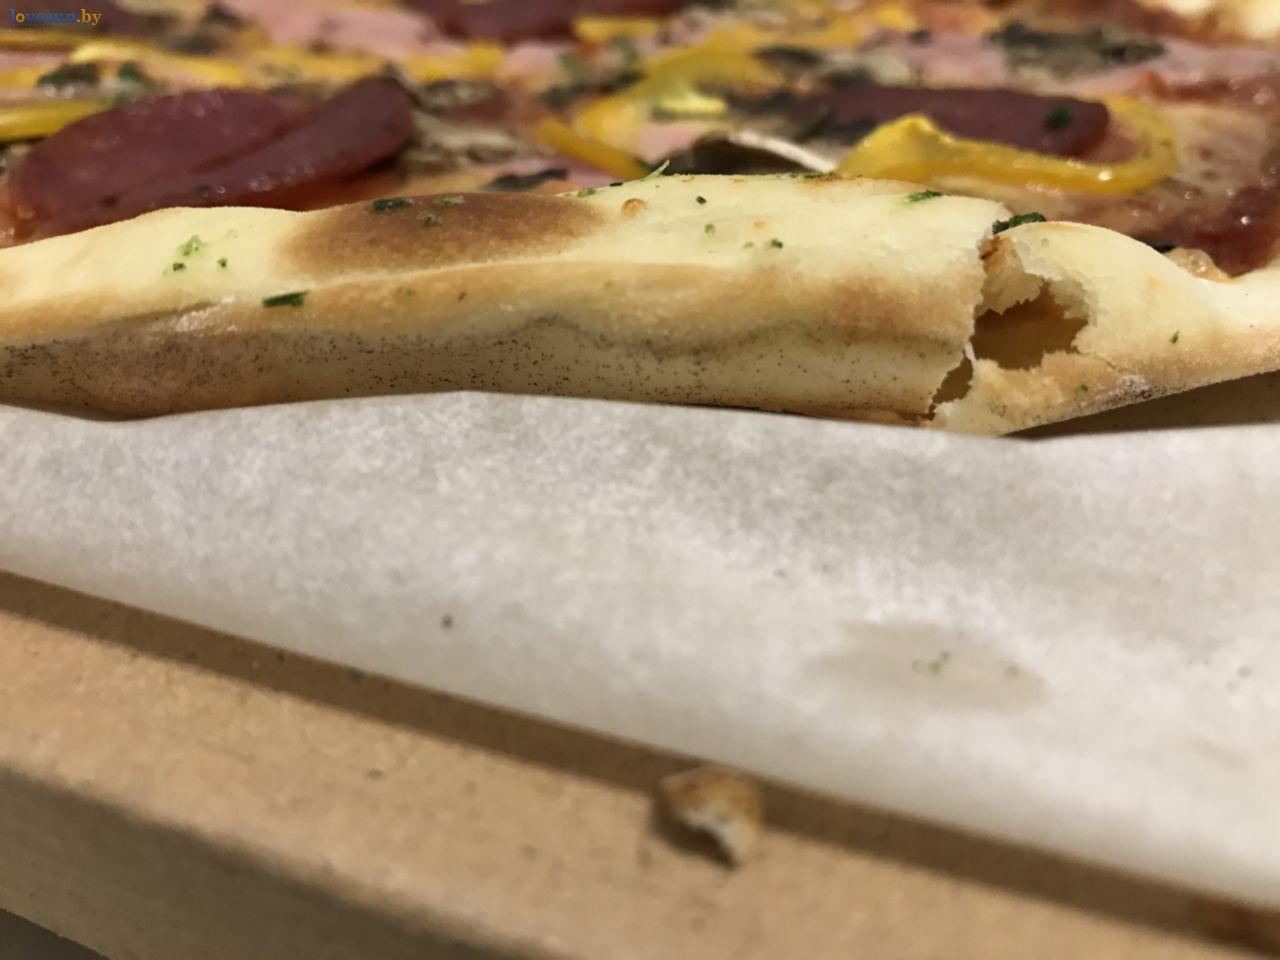 тесто в пицце все готово евроопт